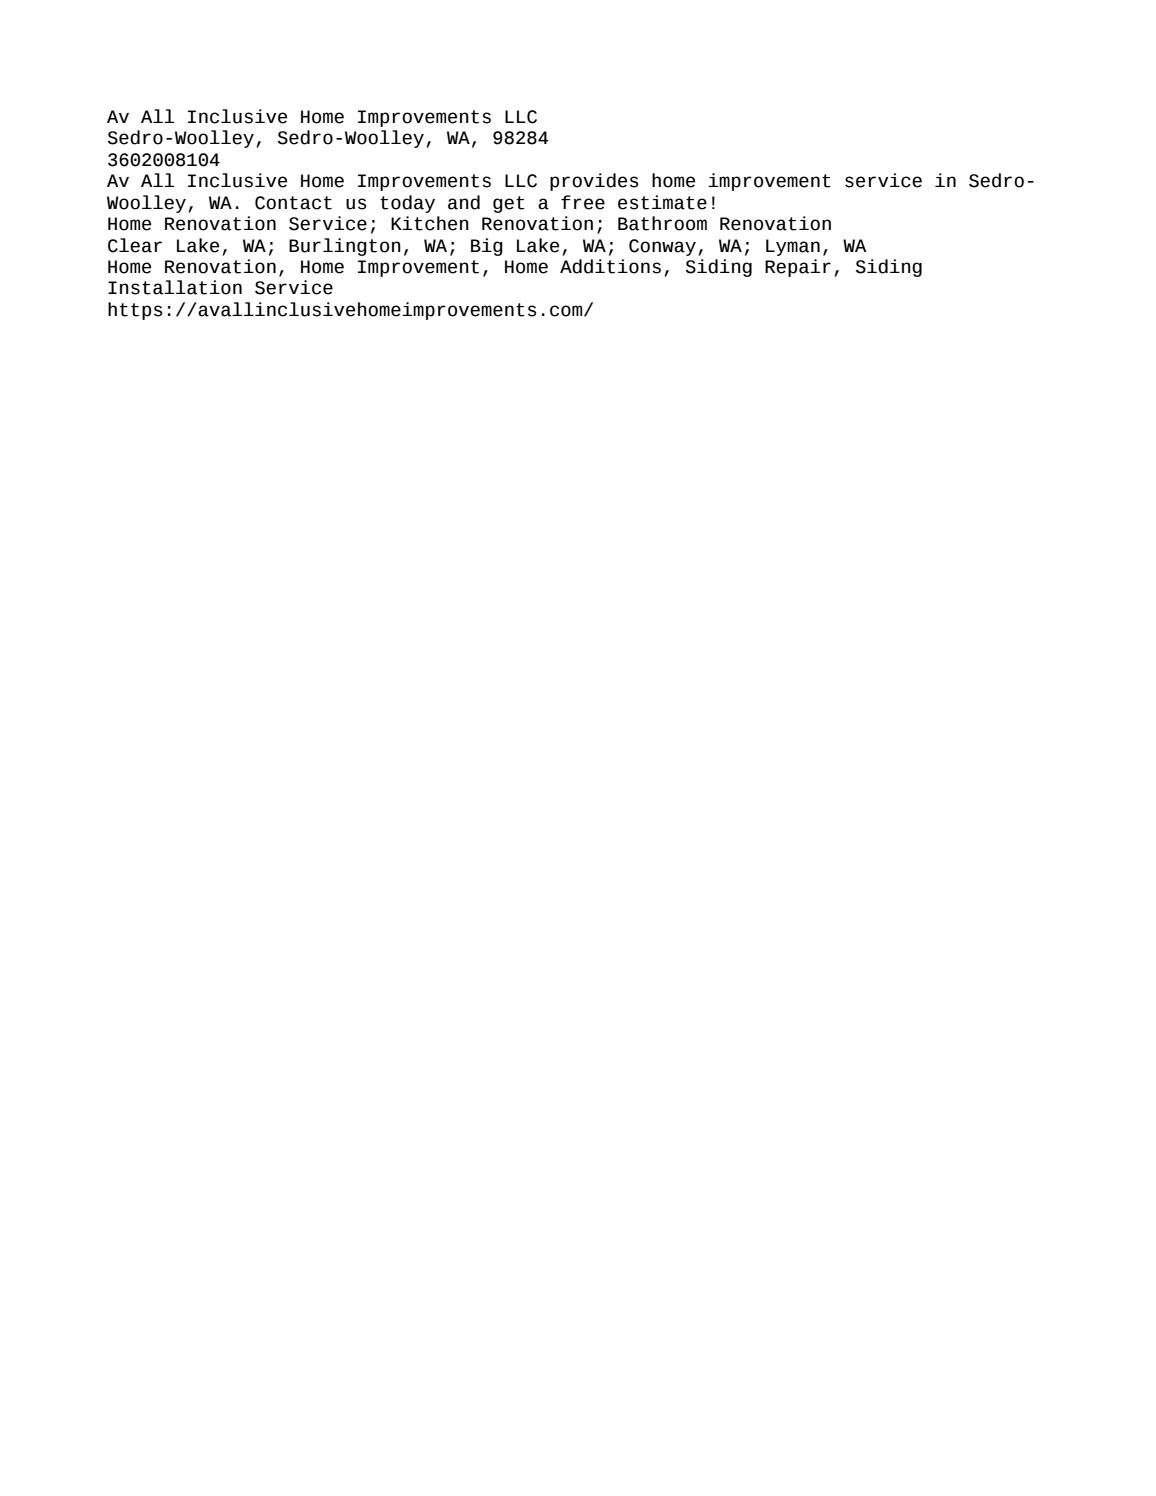 Av All Inclusive Home Improvements Llc 3602008104 By Laymoris23 Issuu